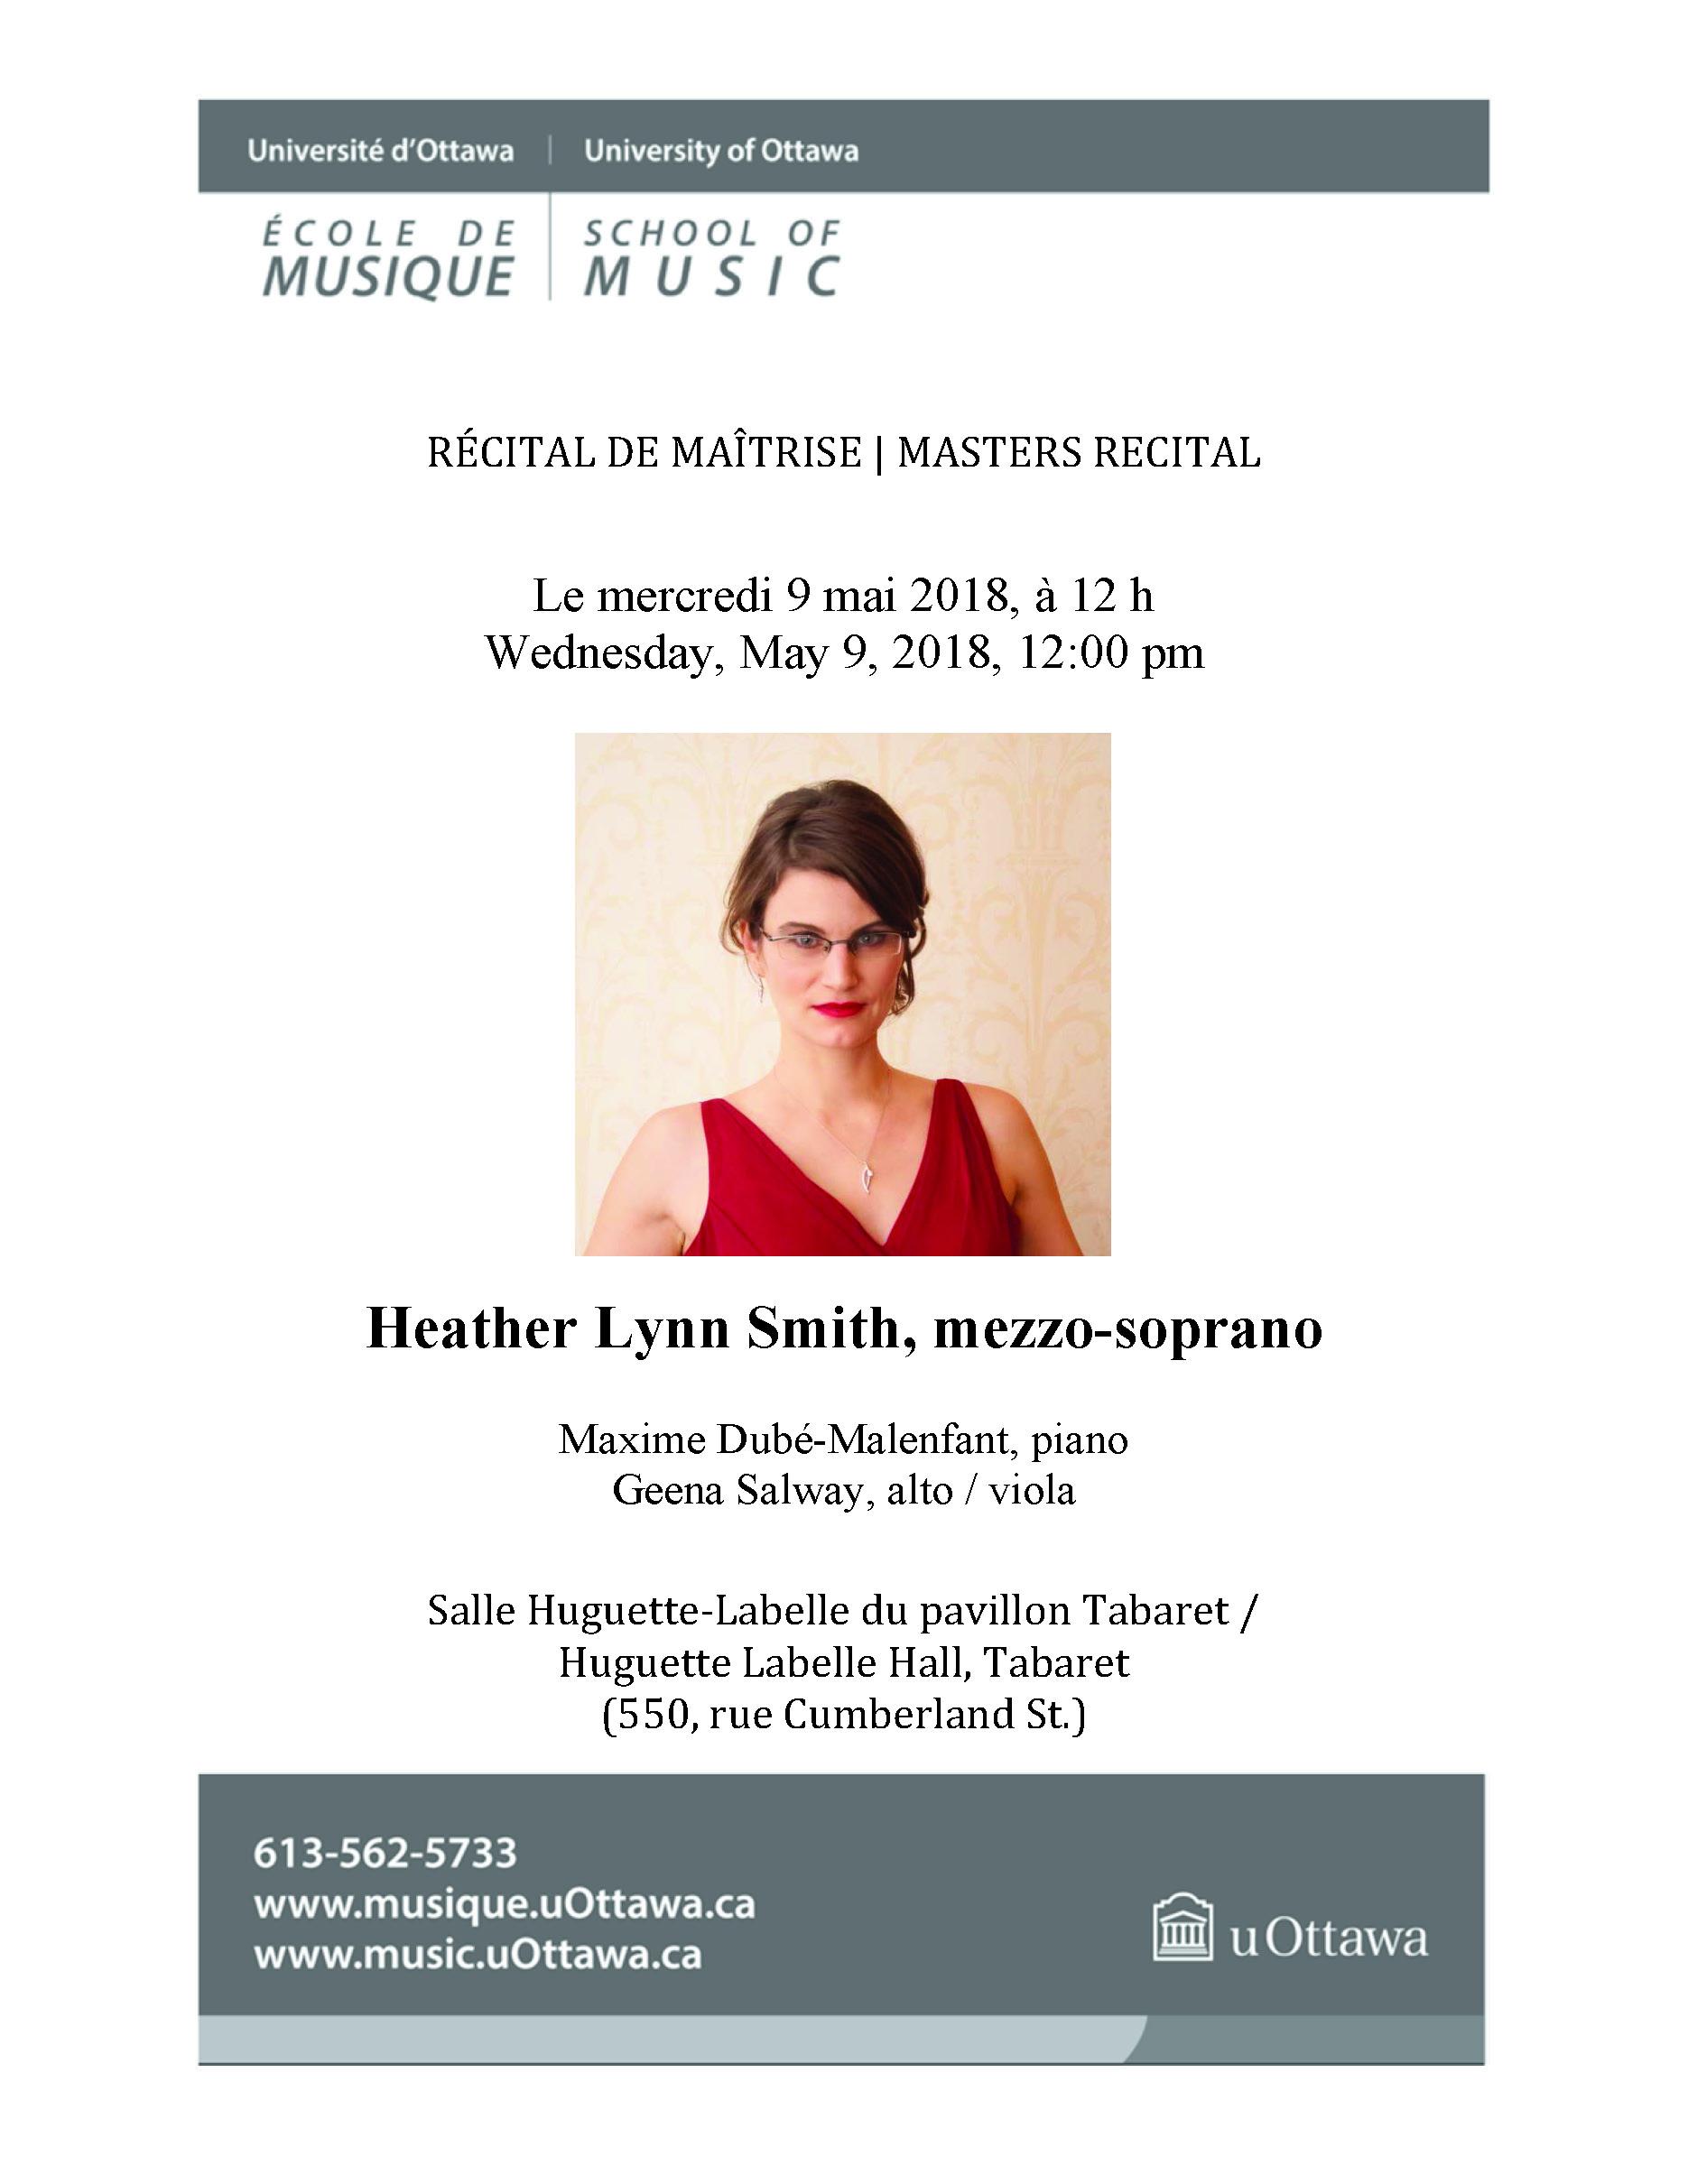 Page 1 of Heather Lynn Smith's recital program